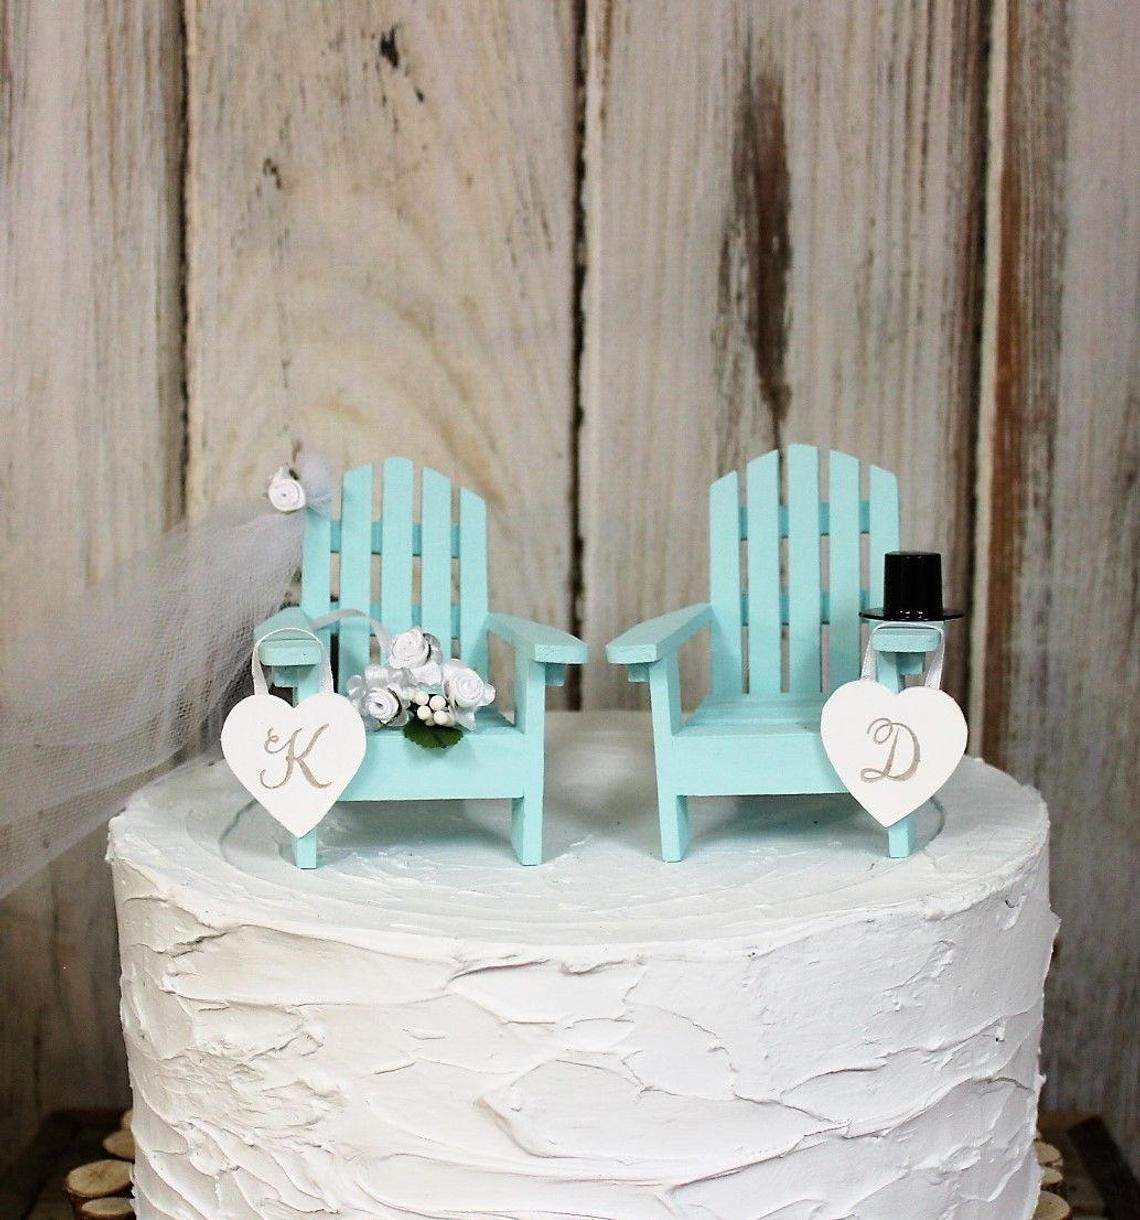 Custom Adirondack Chairs Wedding Cake Topper